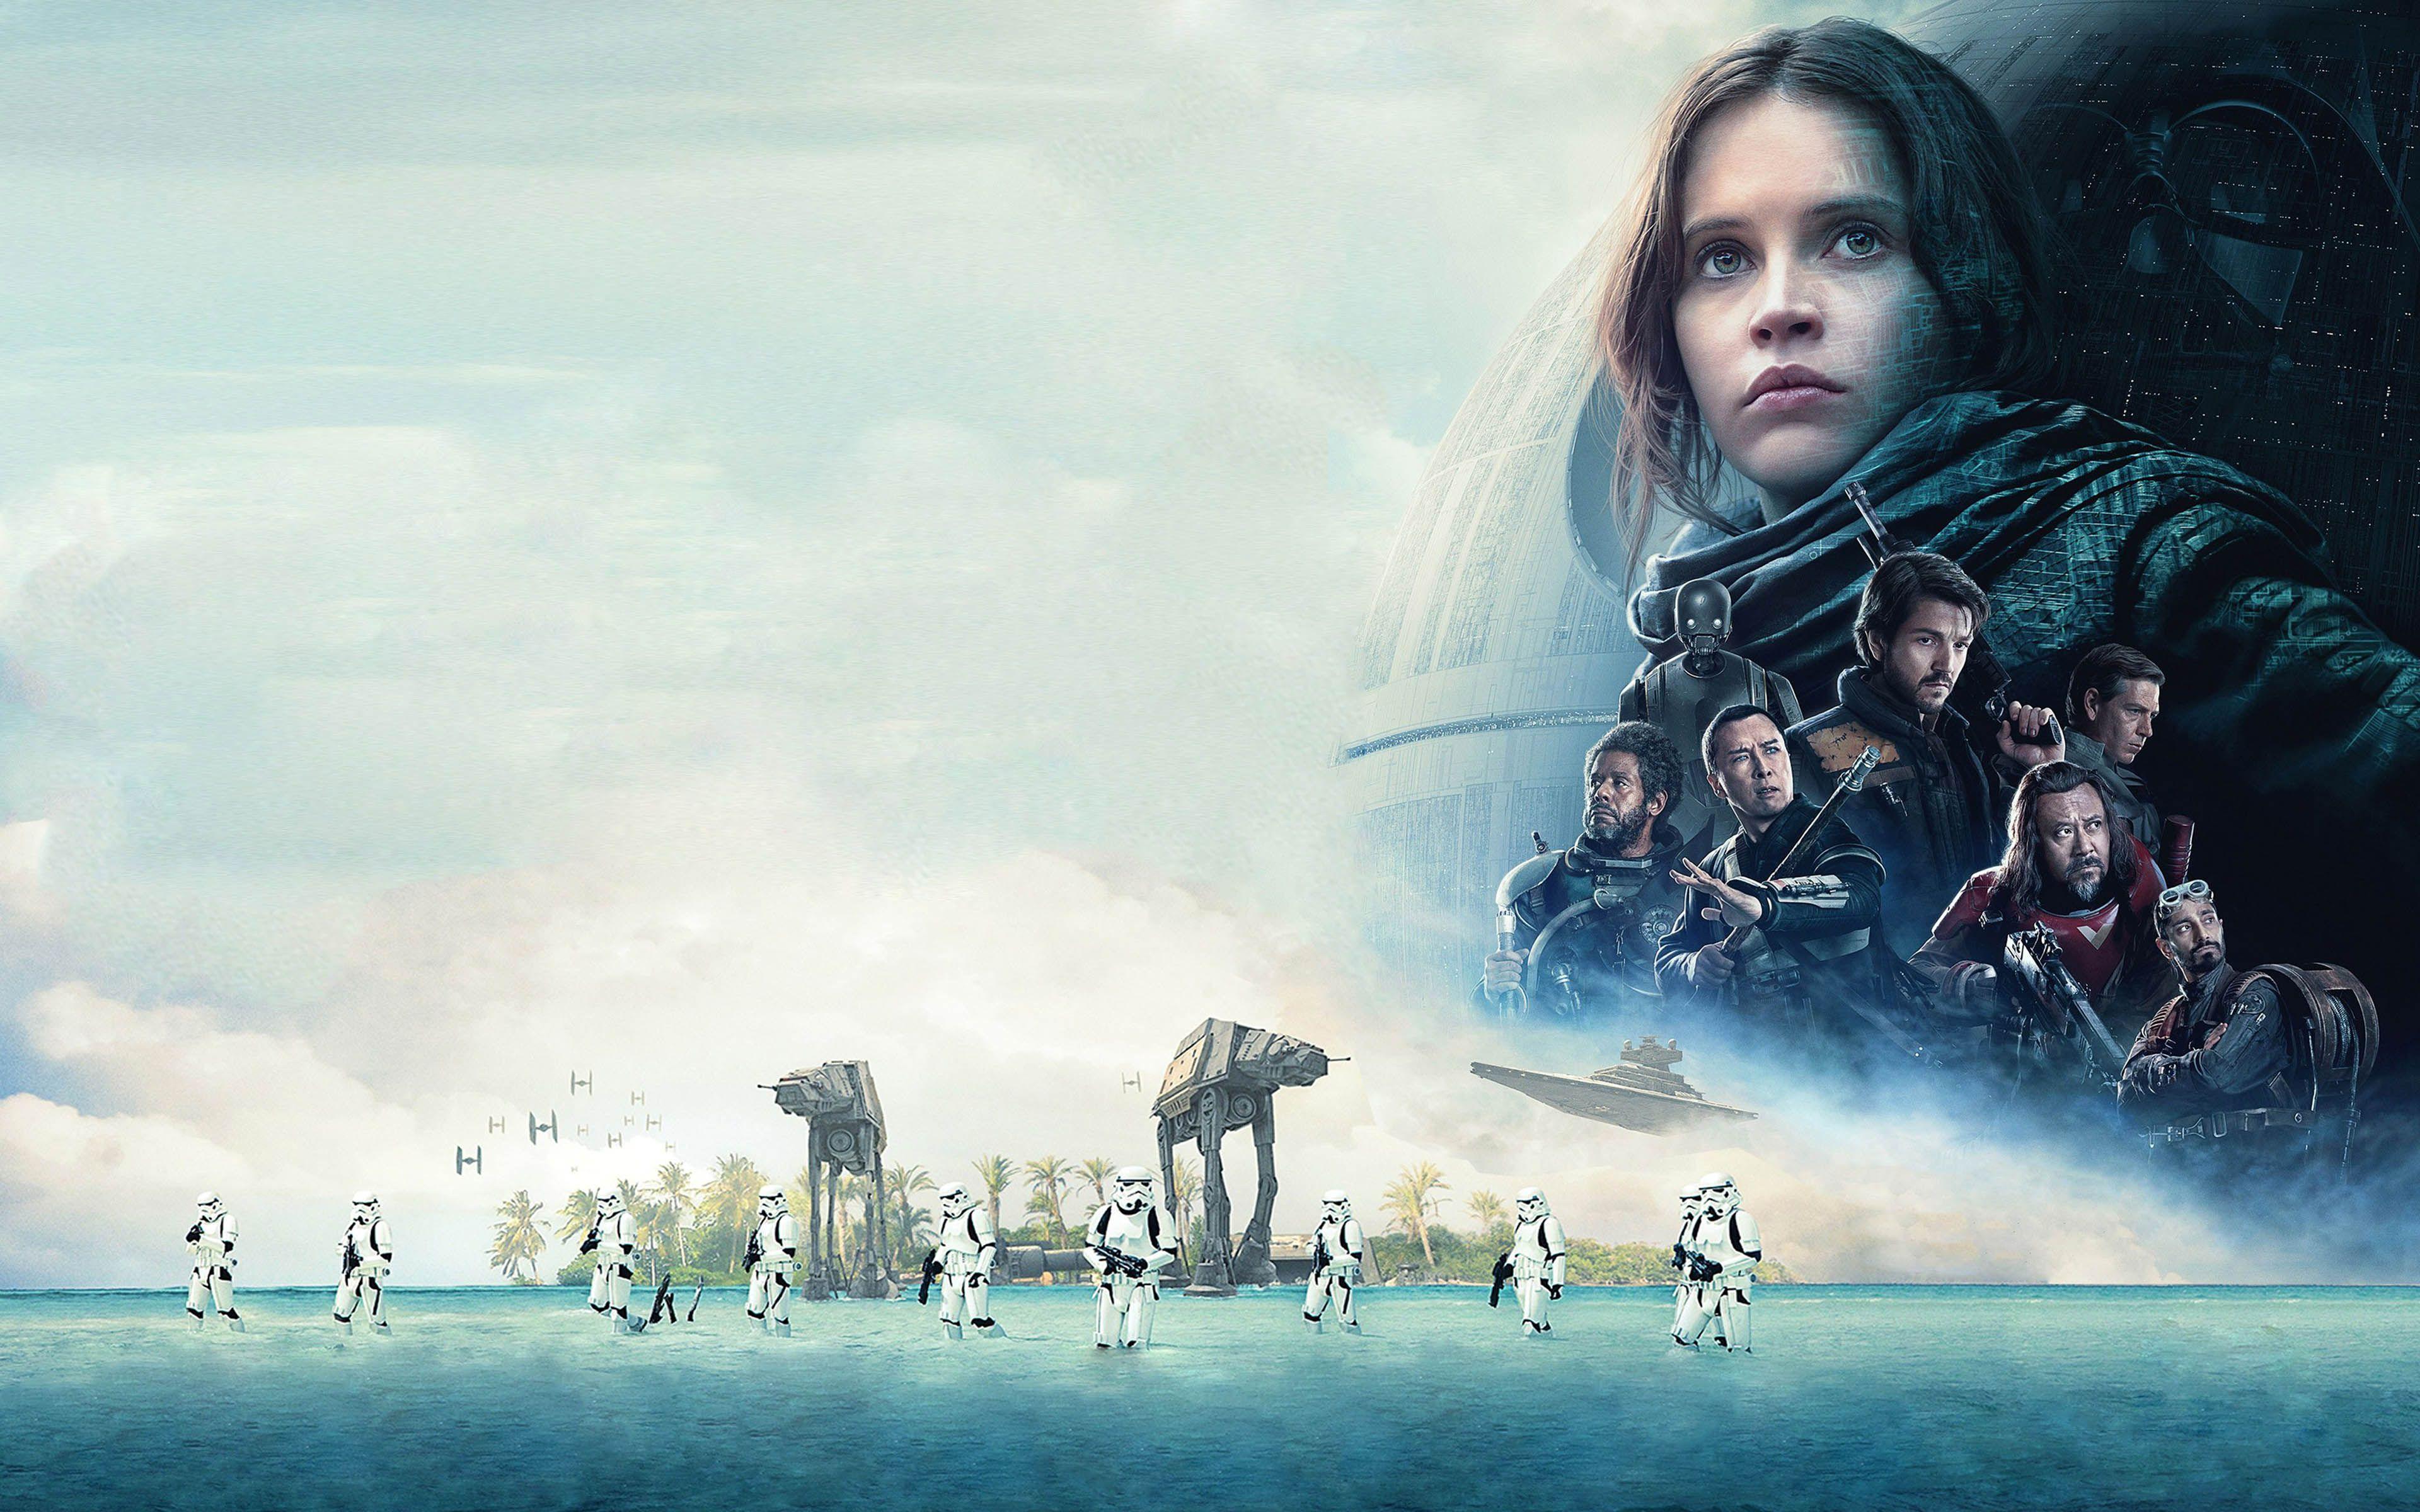 Rogue One A Star Wars Story 4k 3840x2400 Wallpaper Rogue One Star Wars Star Wars Criticos